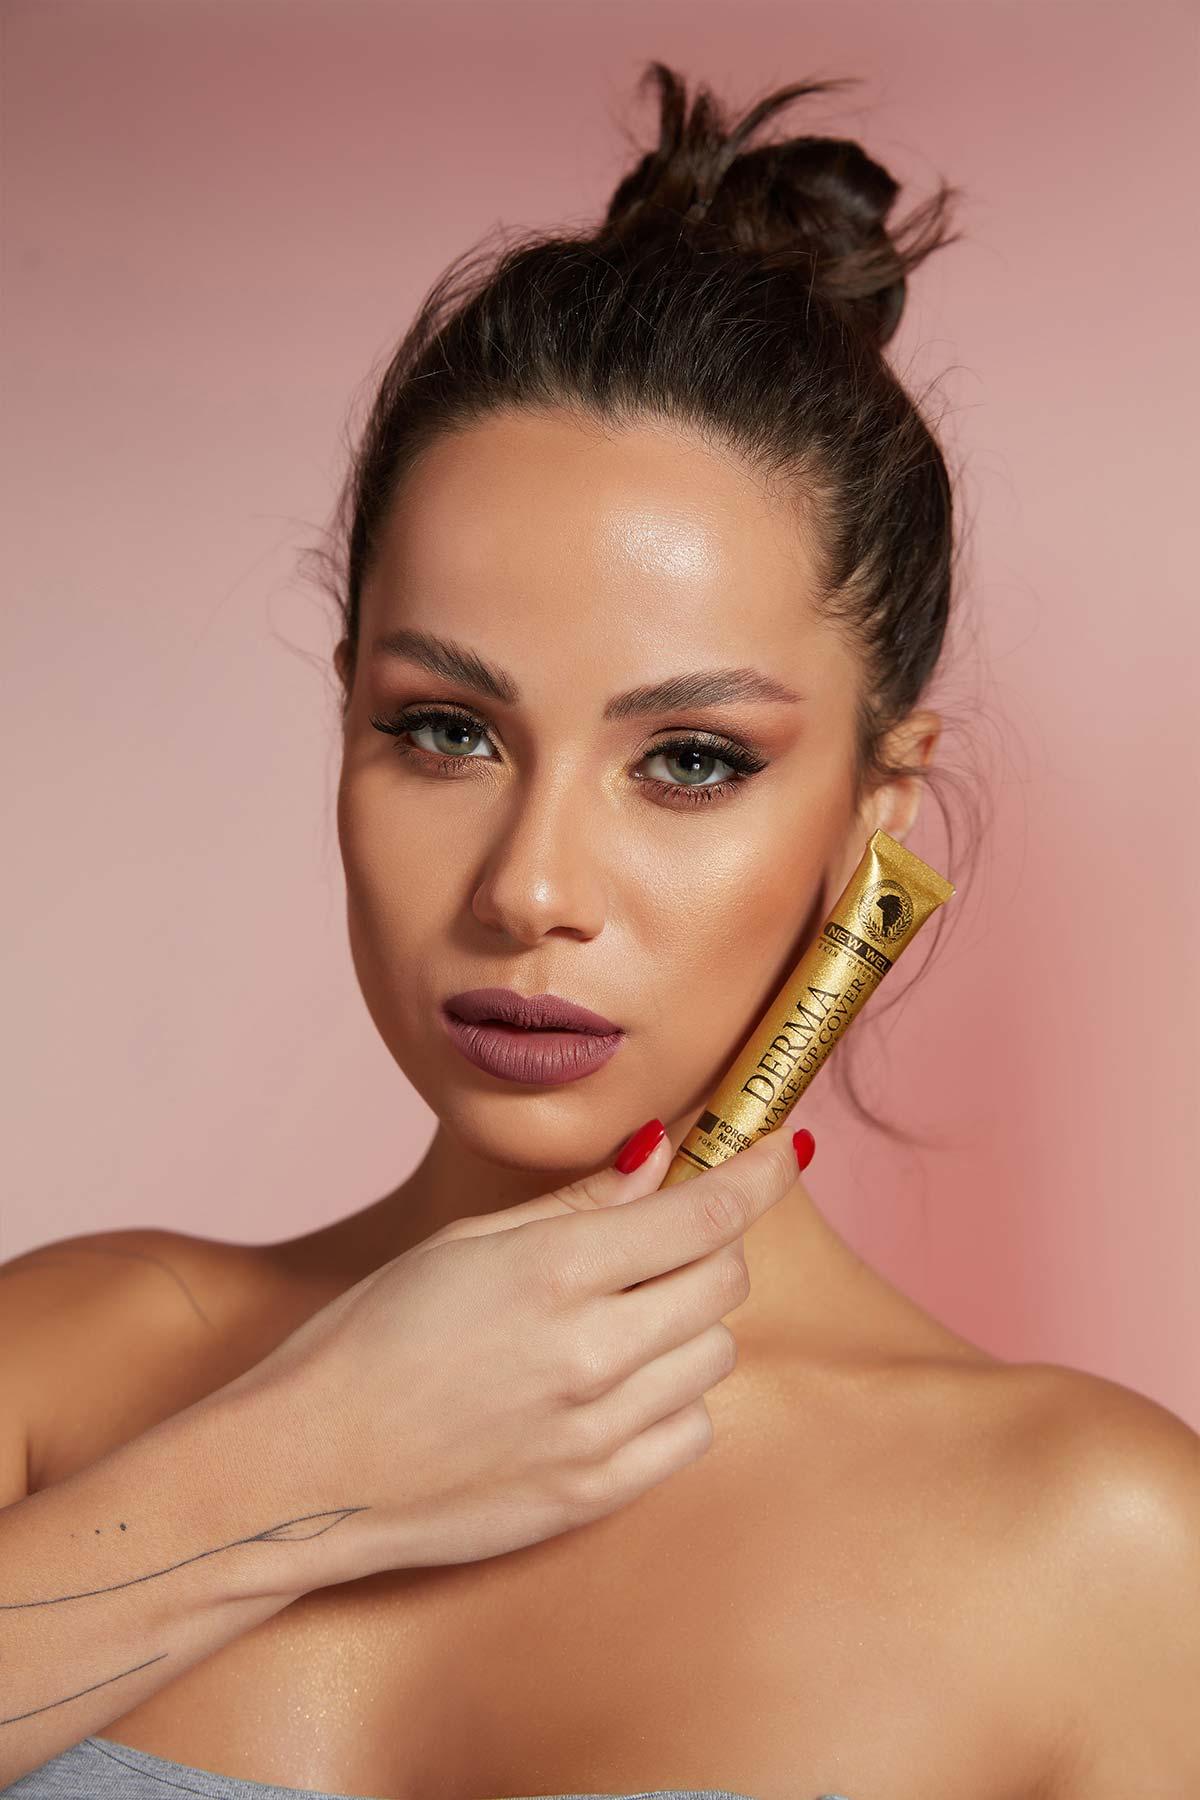 Derma Make-Up Cover Foundation - Platinium -Fondöten - Foundation